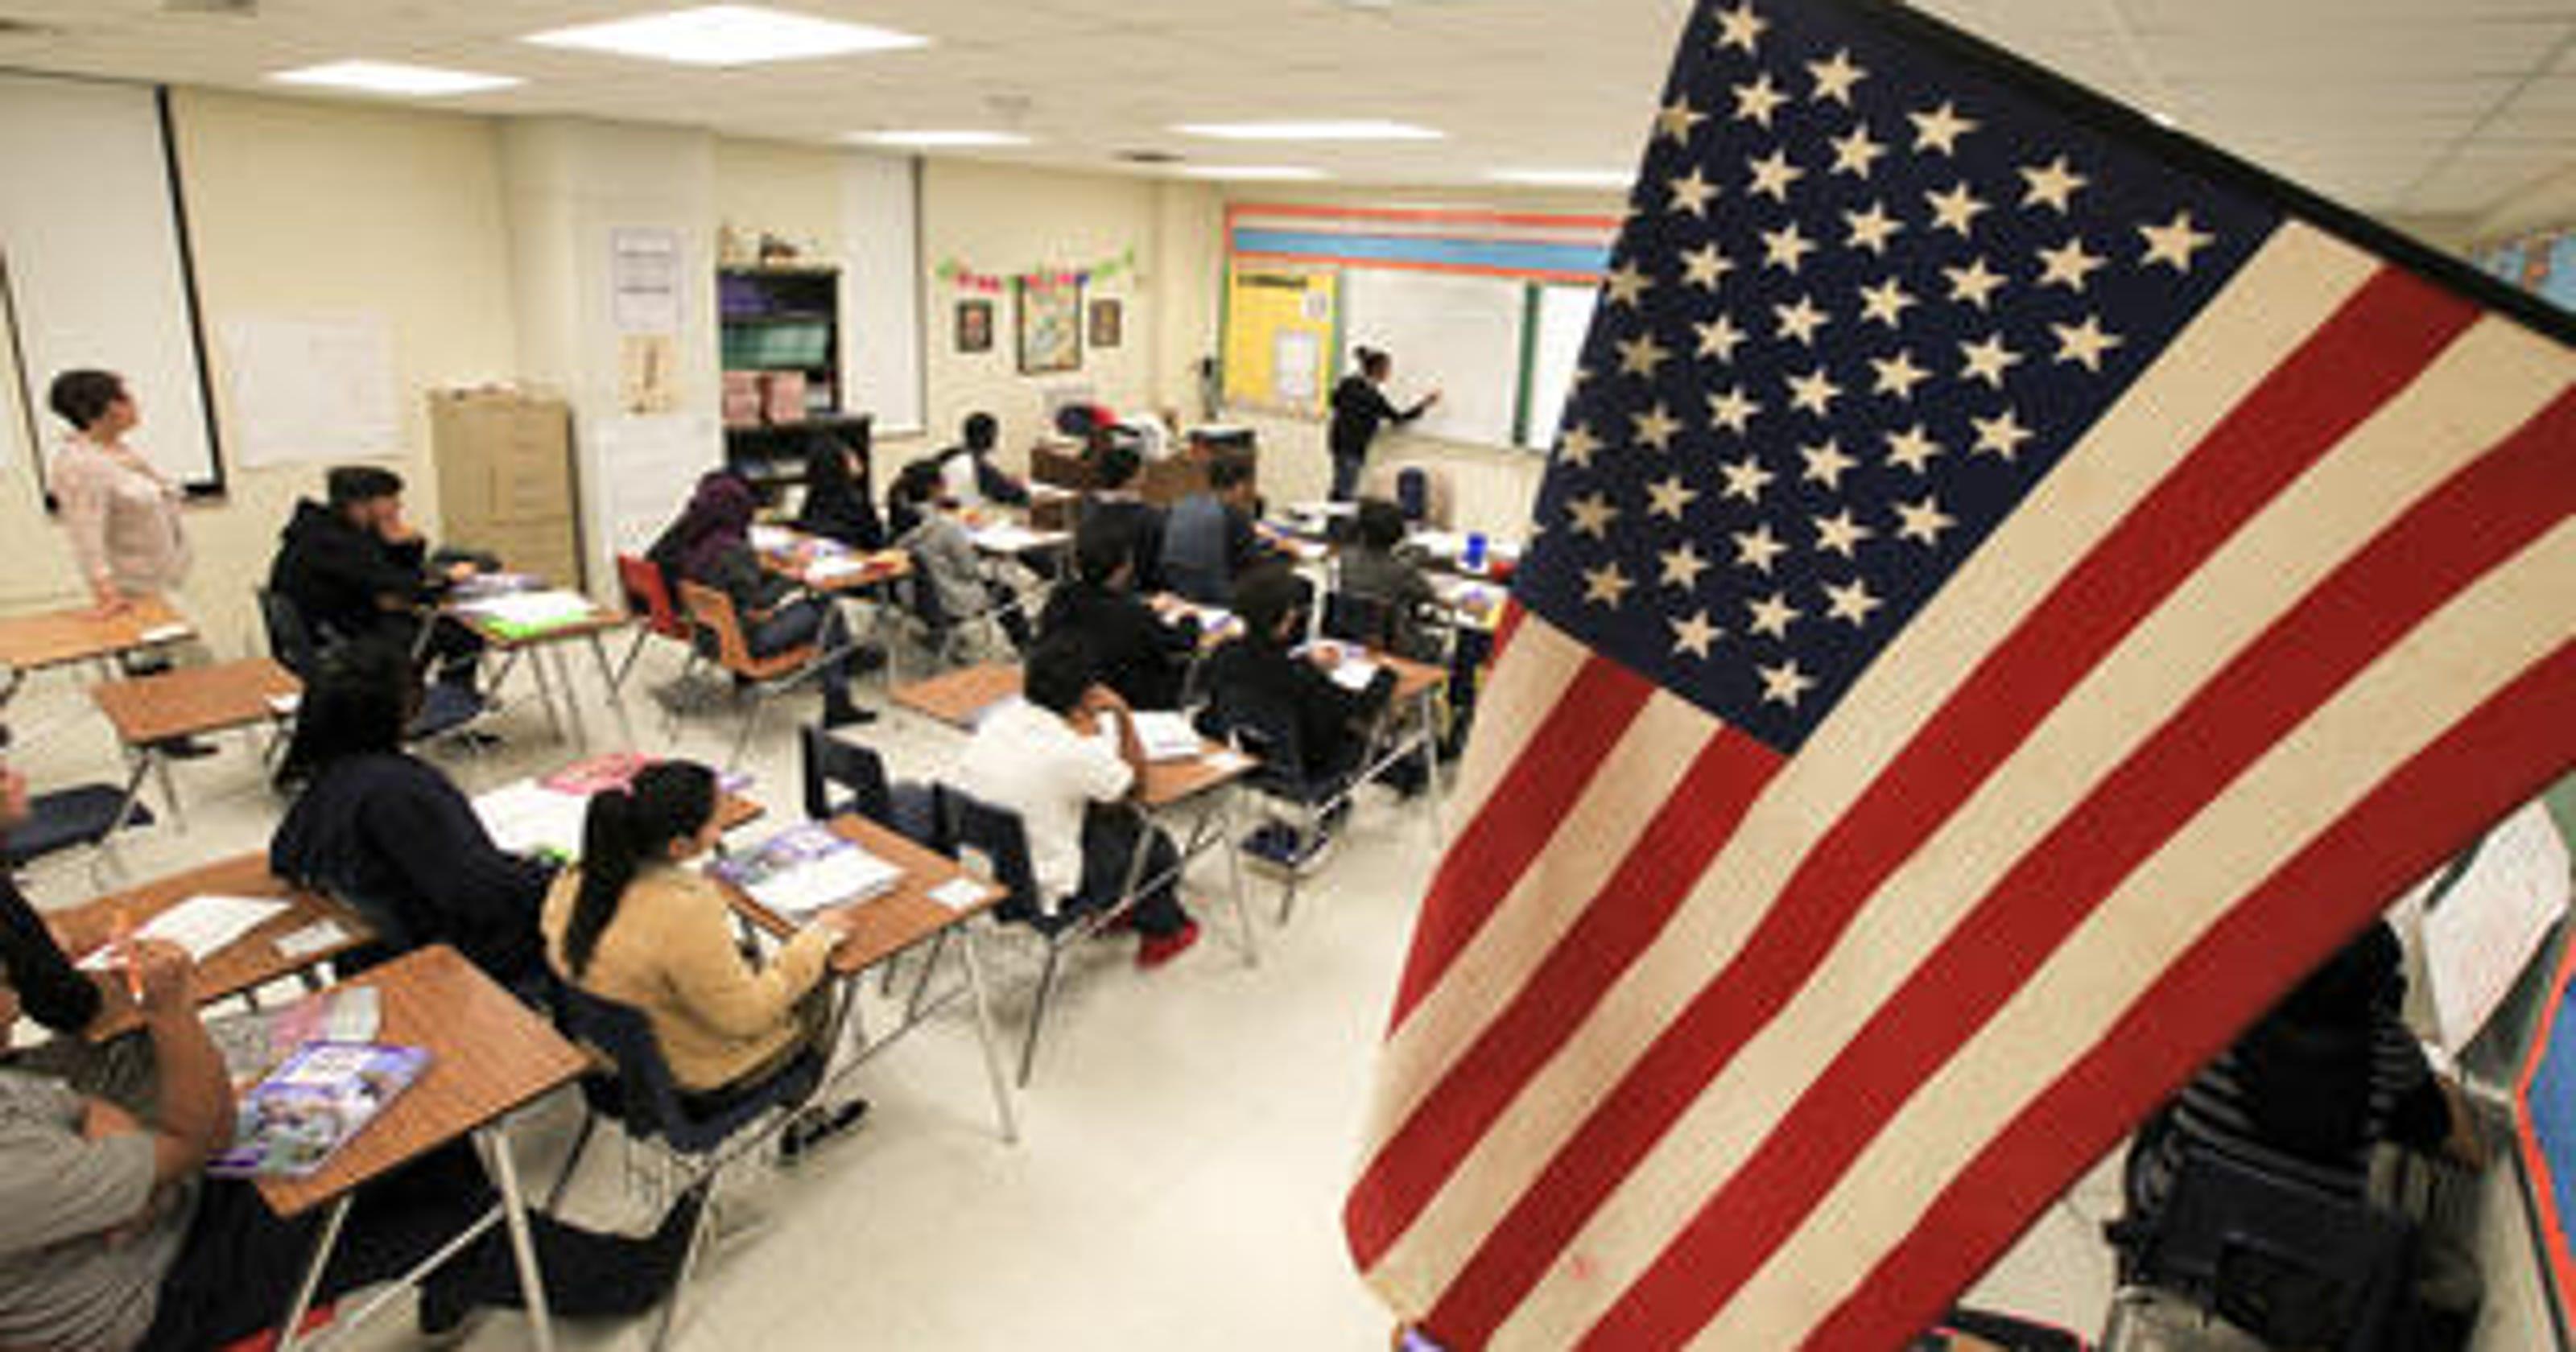 Jefferson County Public Schools battling inequity 40 years after  desegregation order